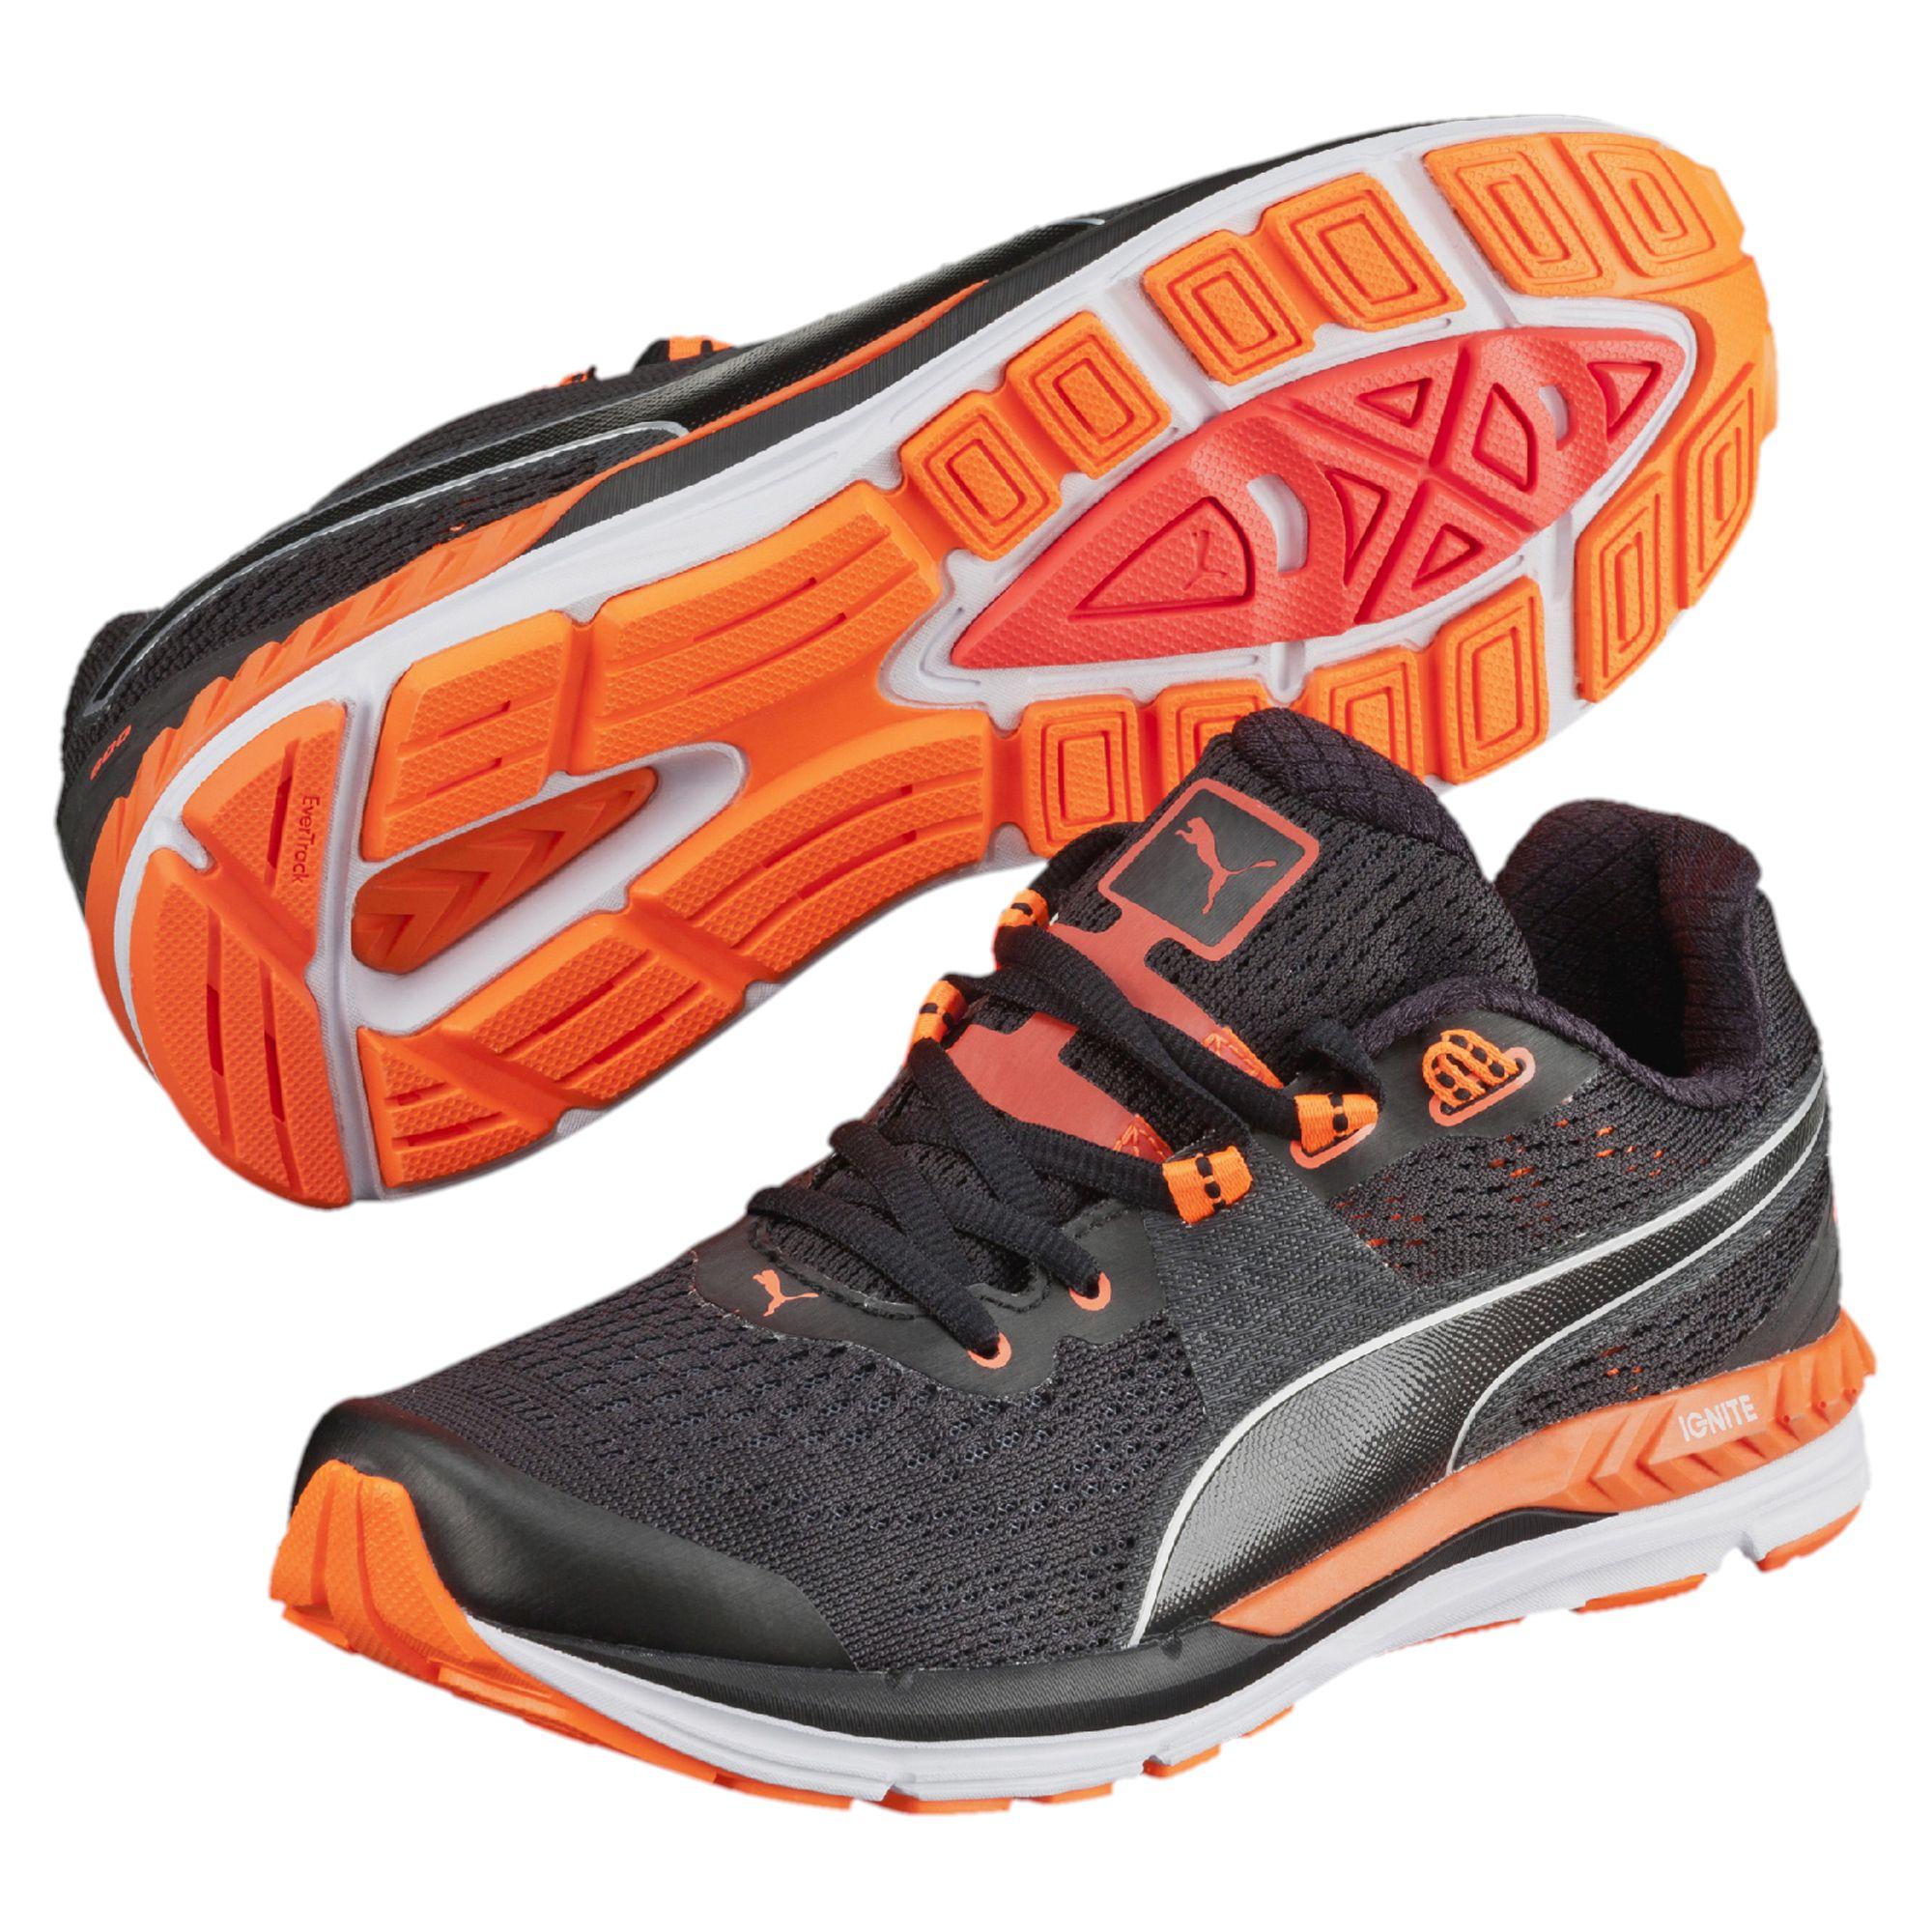 Lyst - PUMA Speed 600 Ignite Women s Running Shoes in Black b4ab9545991db